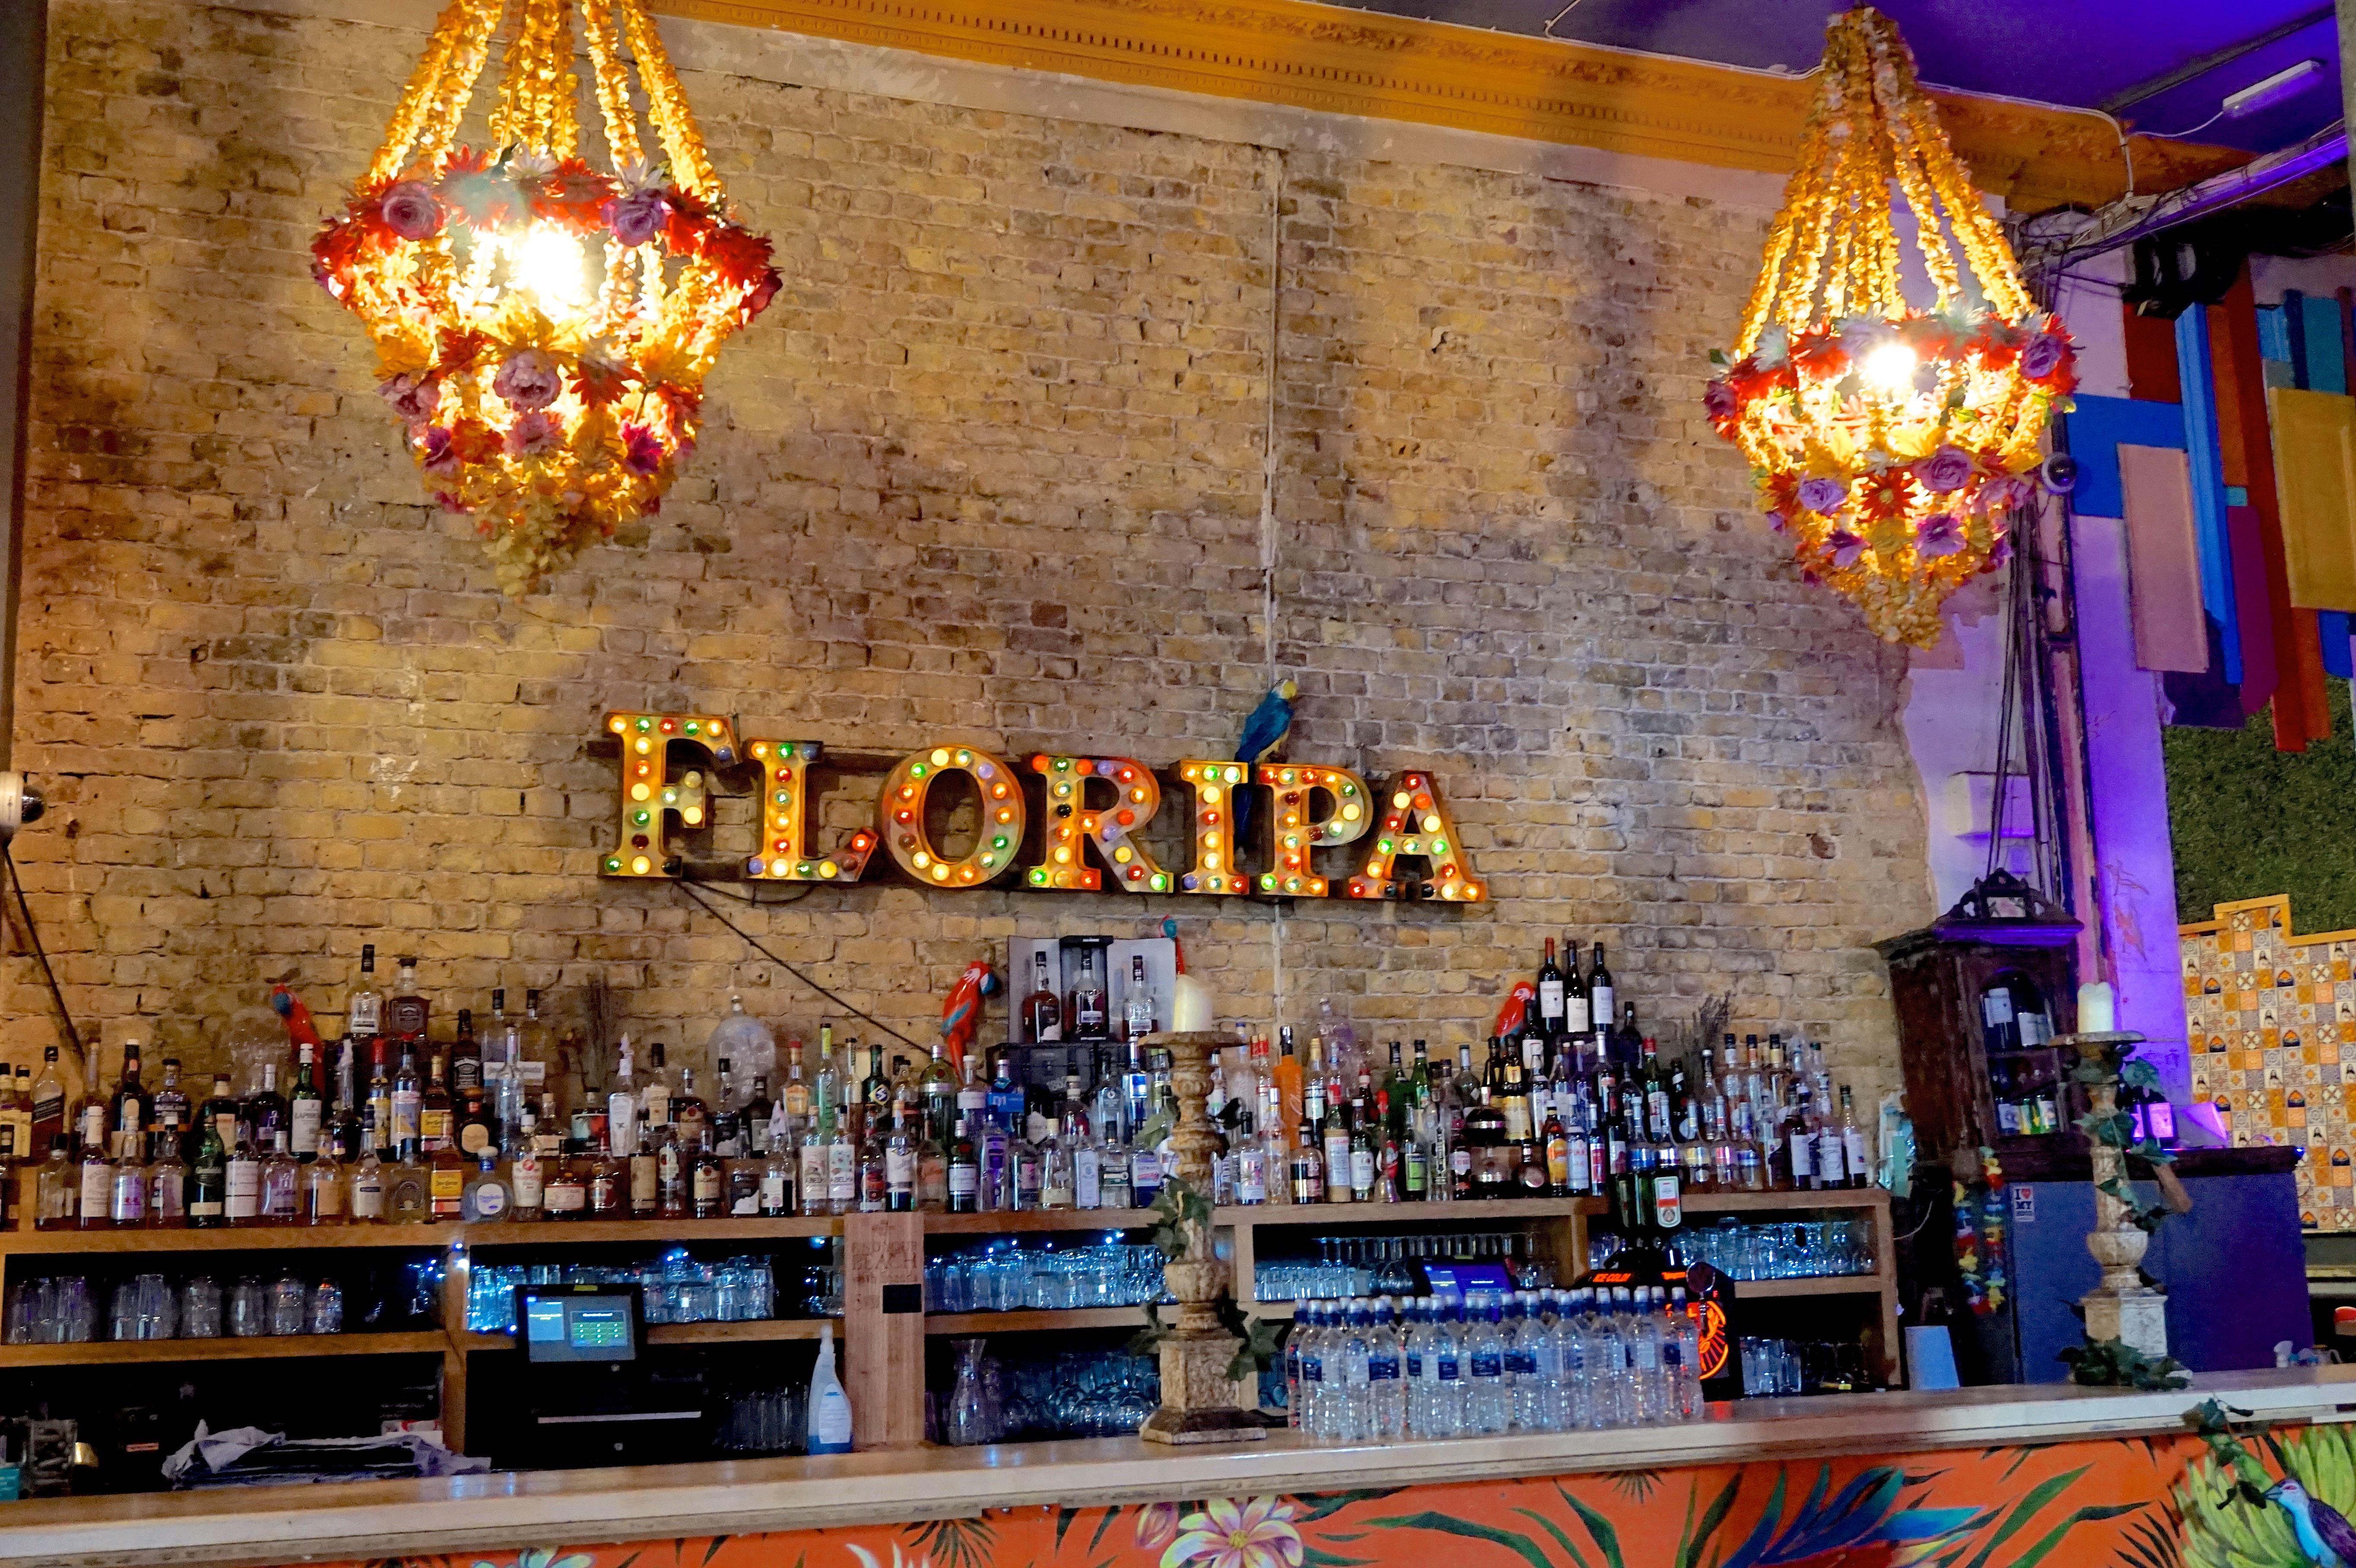 floripa brazil bar london